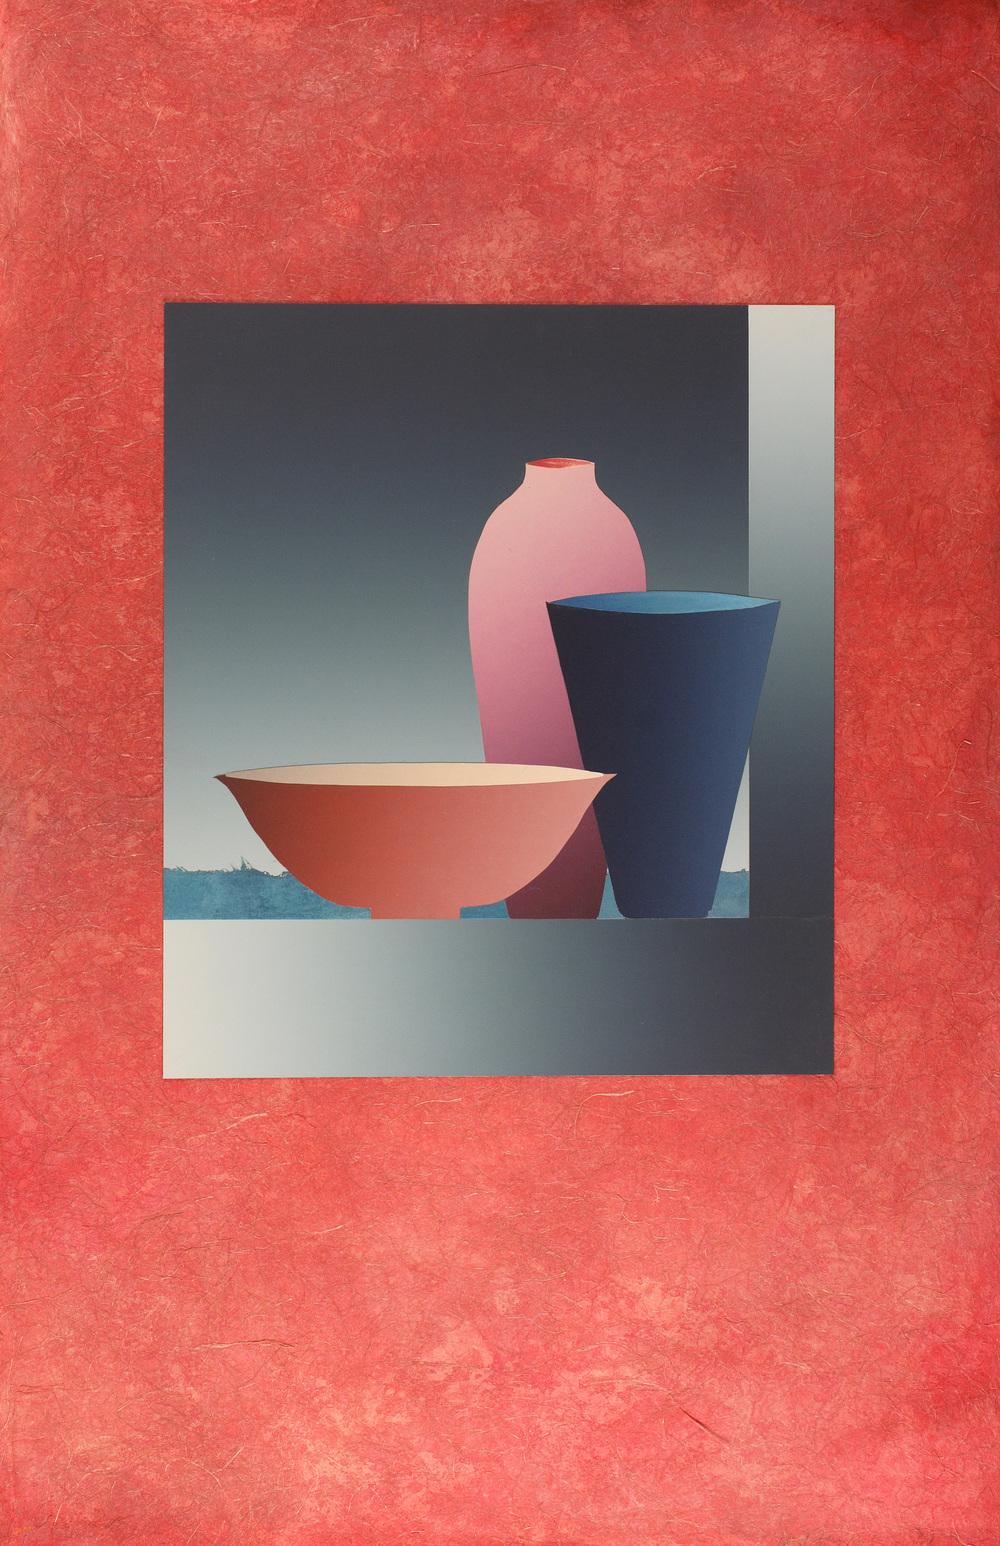 Vases8-36X23.5.jpg